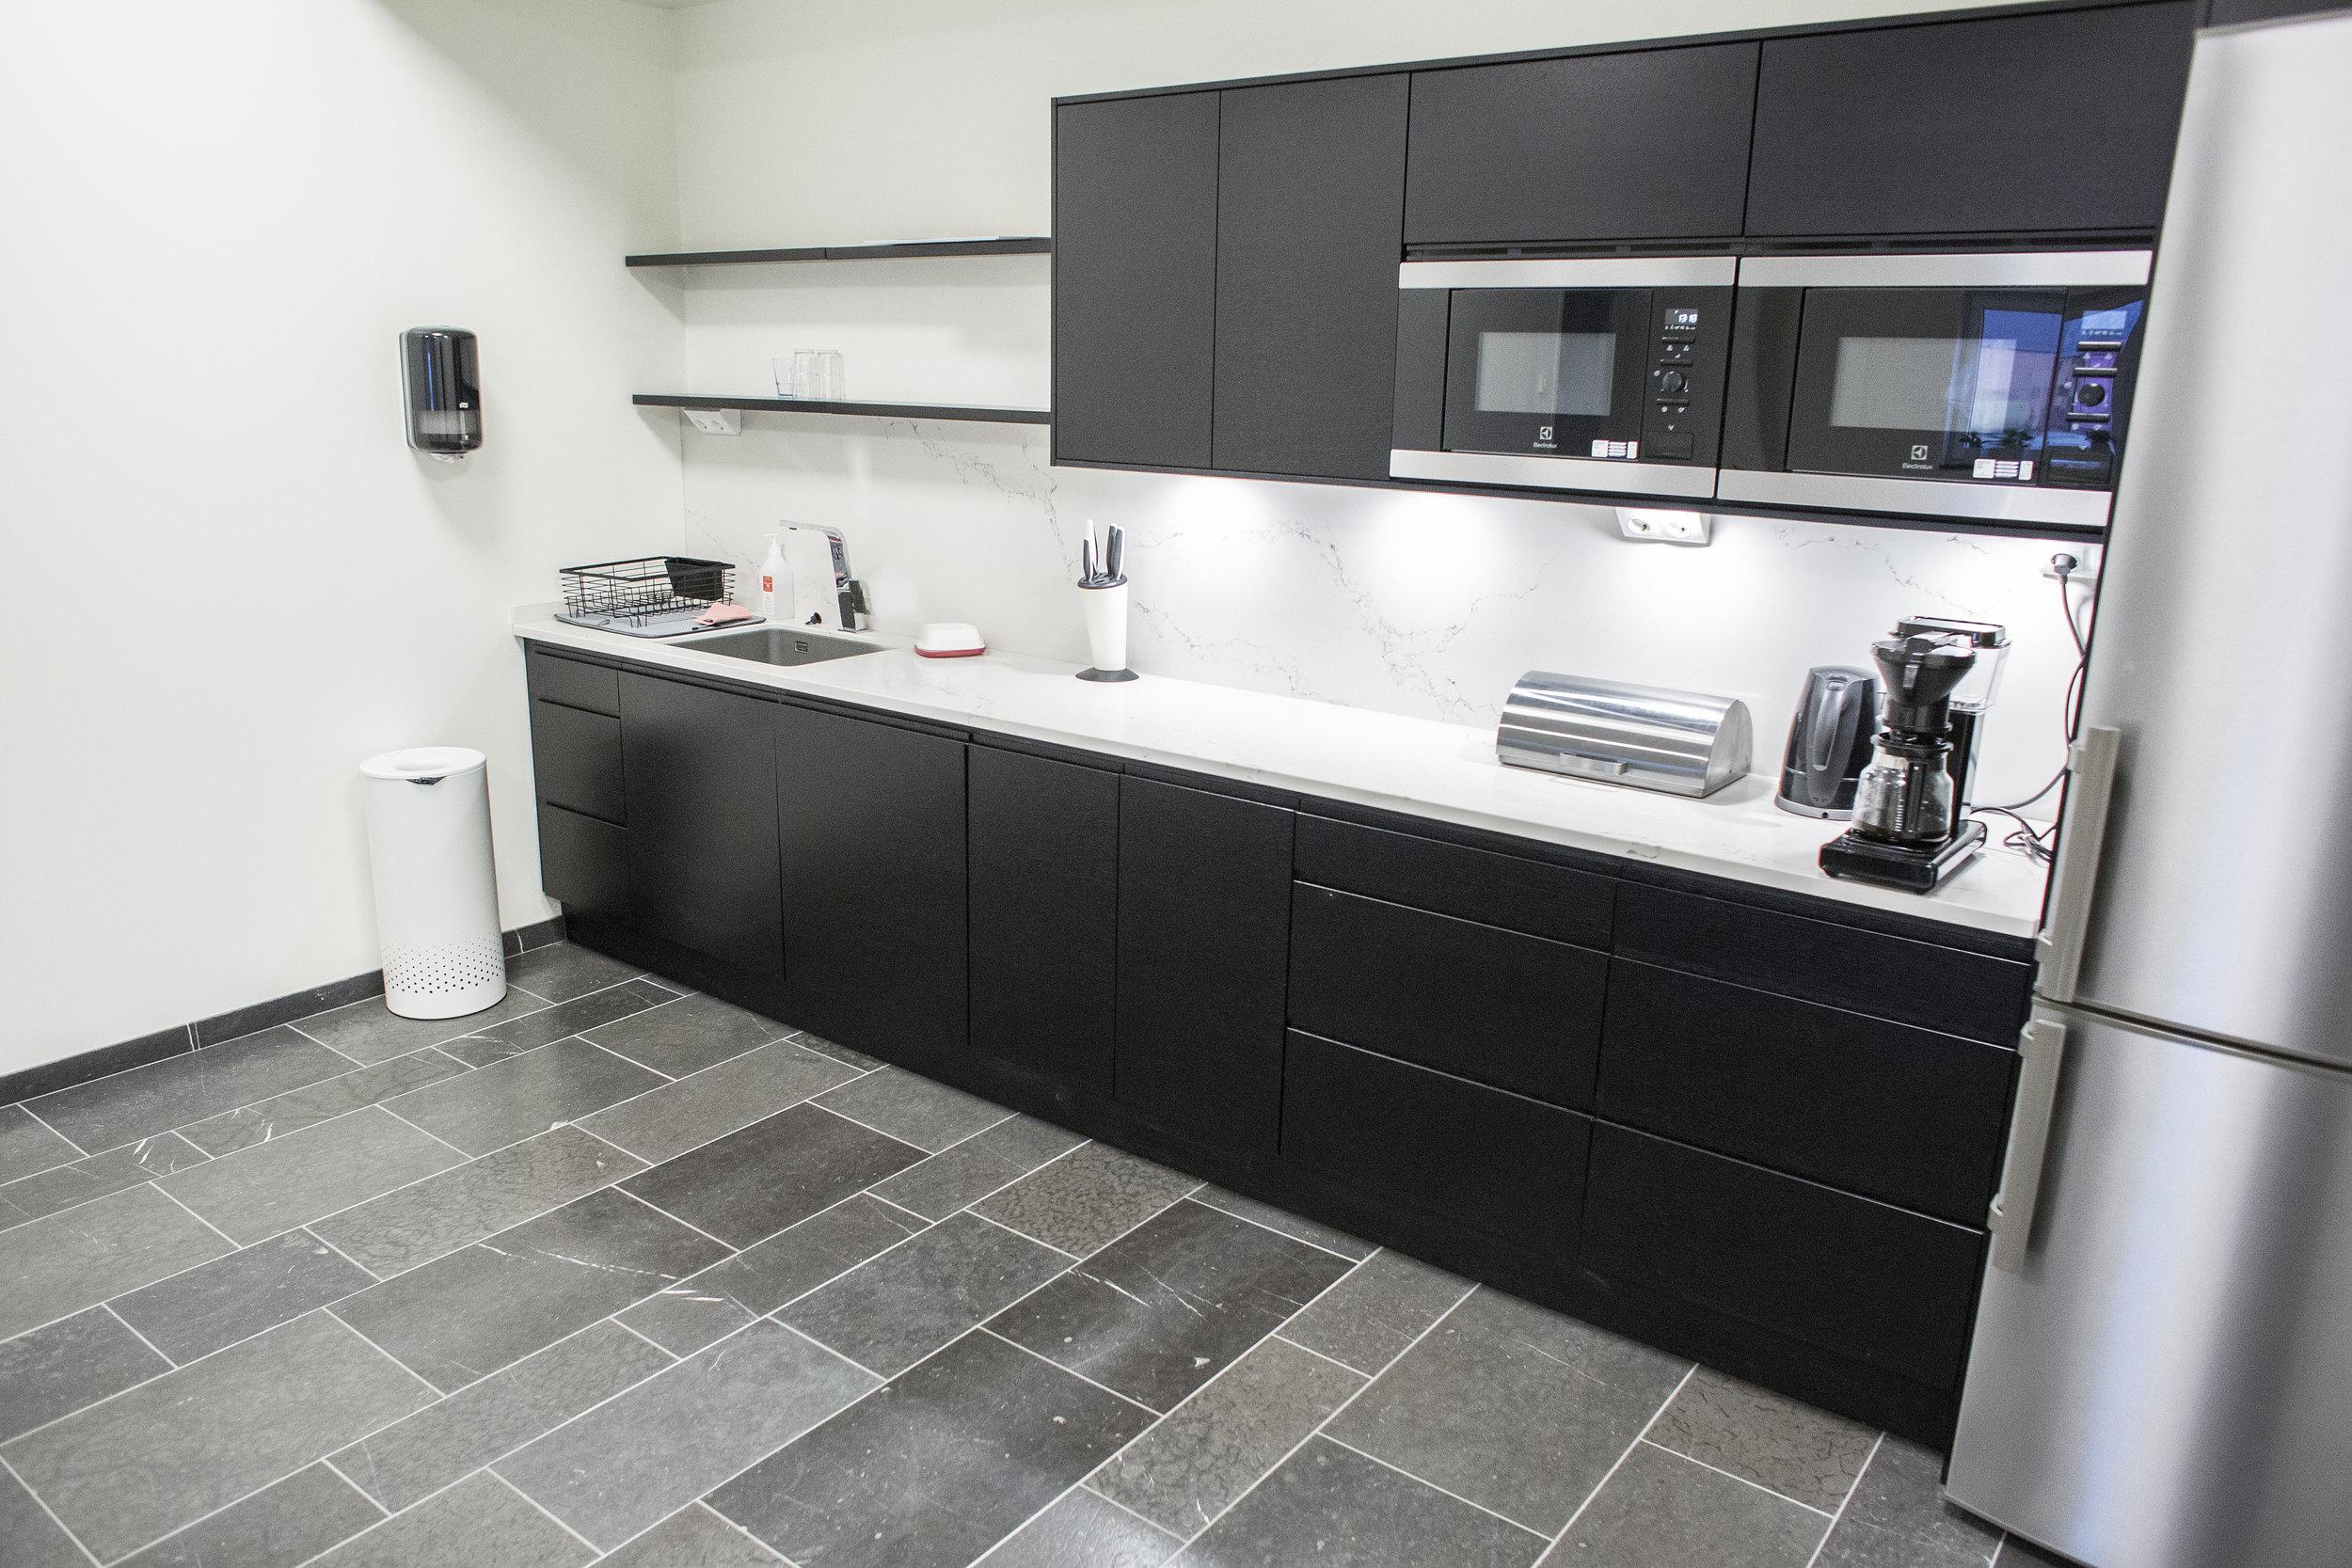 Golv: Rustik svart jämtland / Bänkskiva: Kompositsten ::: Floor: Rustic black Jämtland / Kitchen top: Composite stone